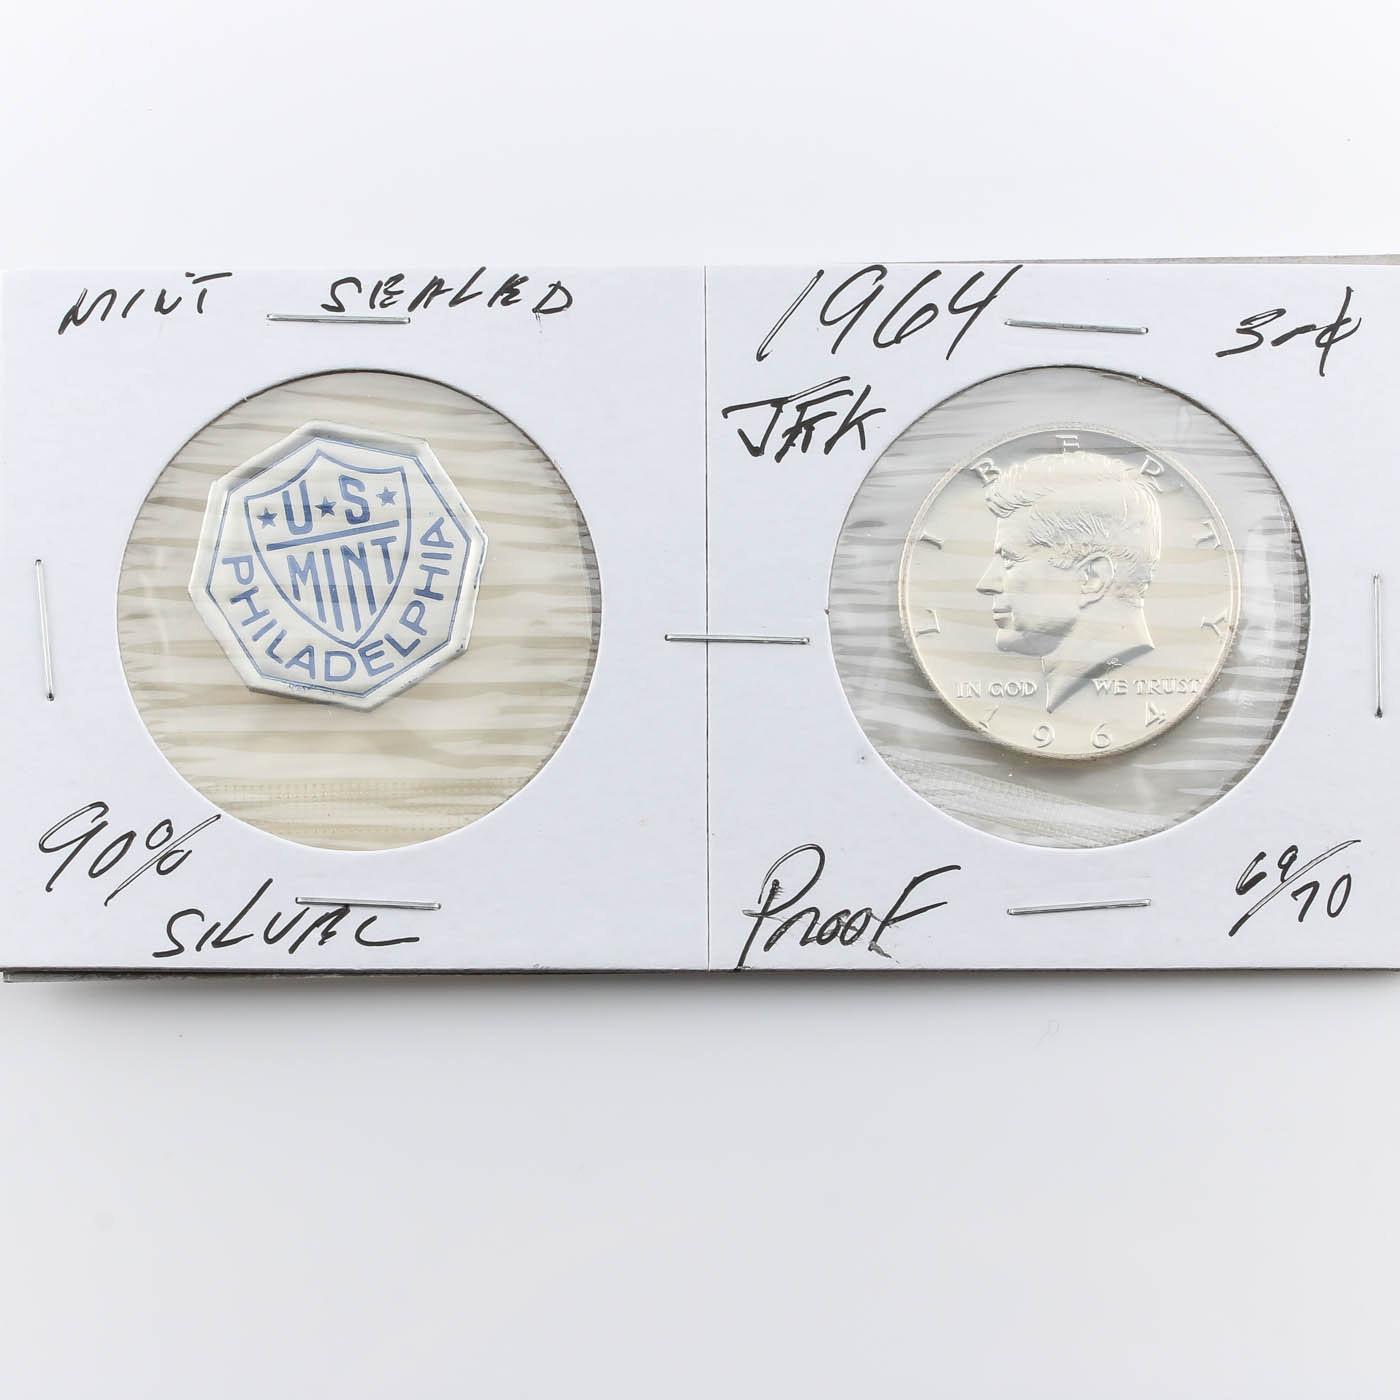 1964 JFK Silver Half Dollar Proof Coin